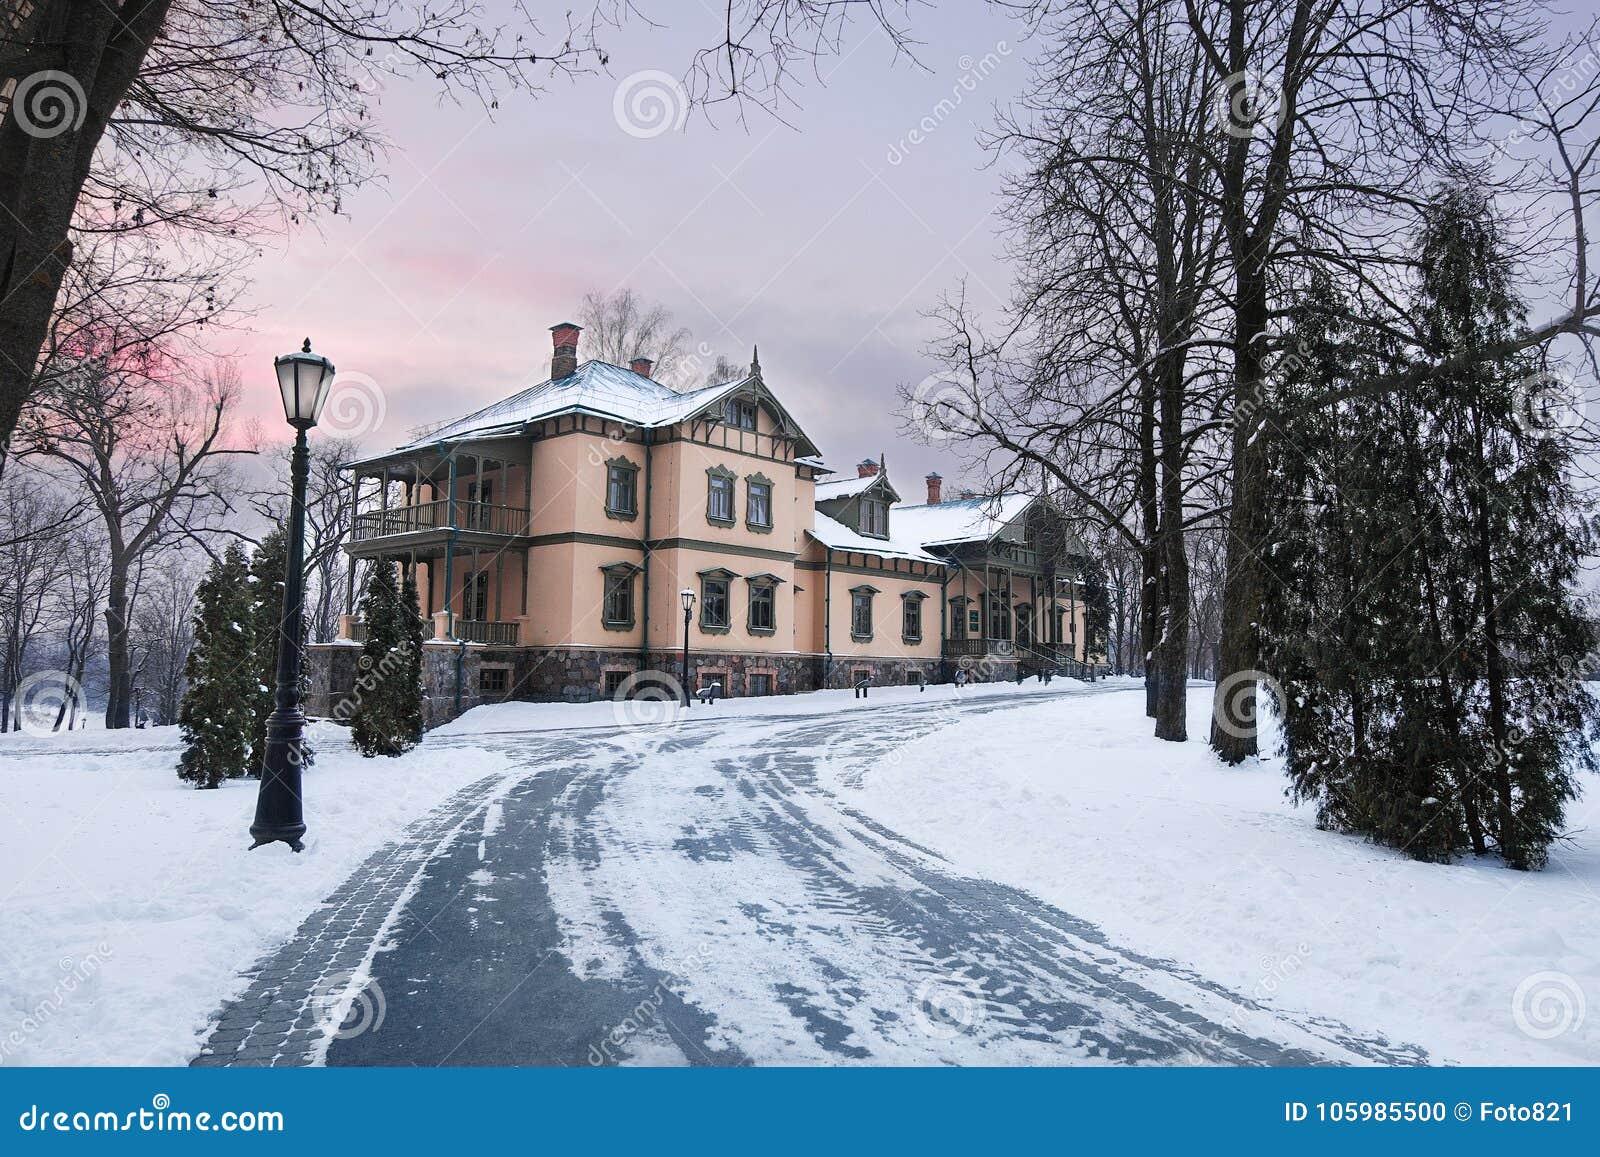 Loshitsa Manor, Belarus, Minsk